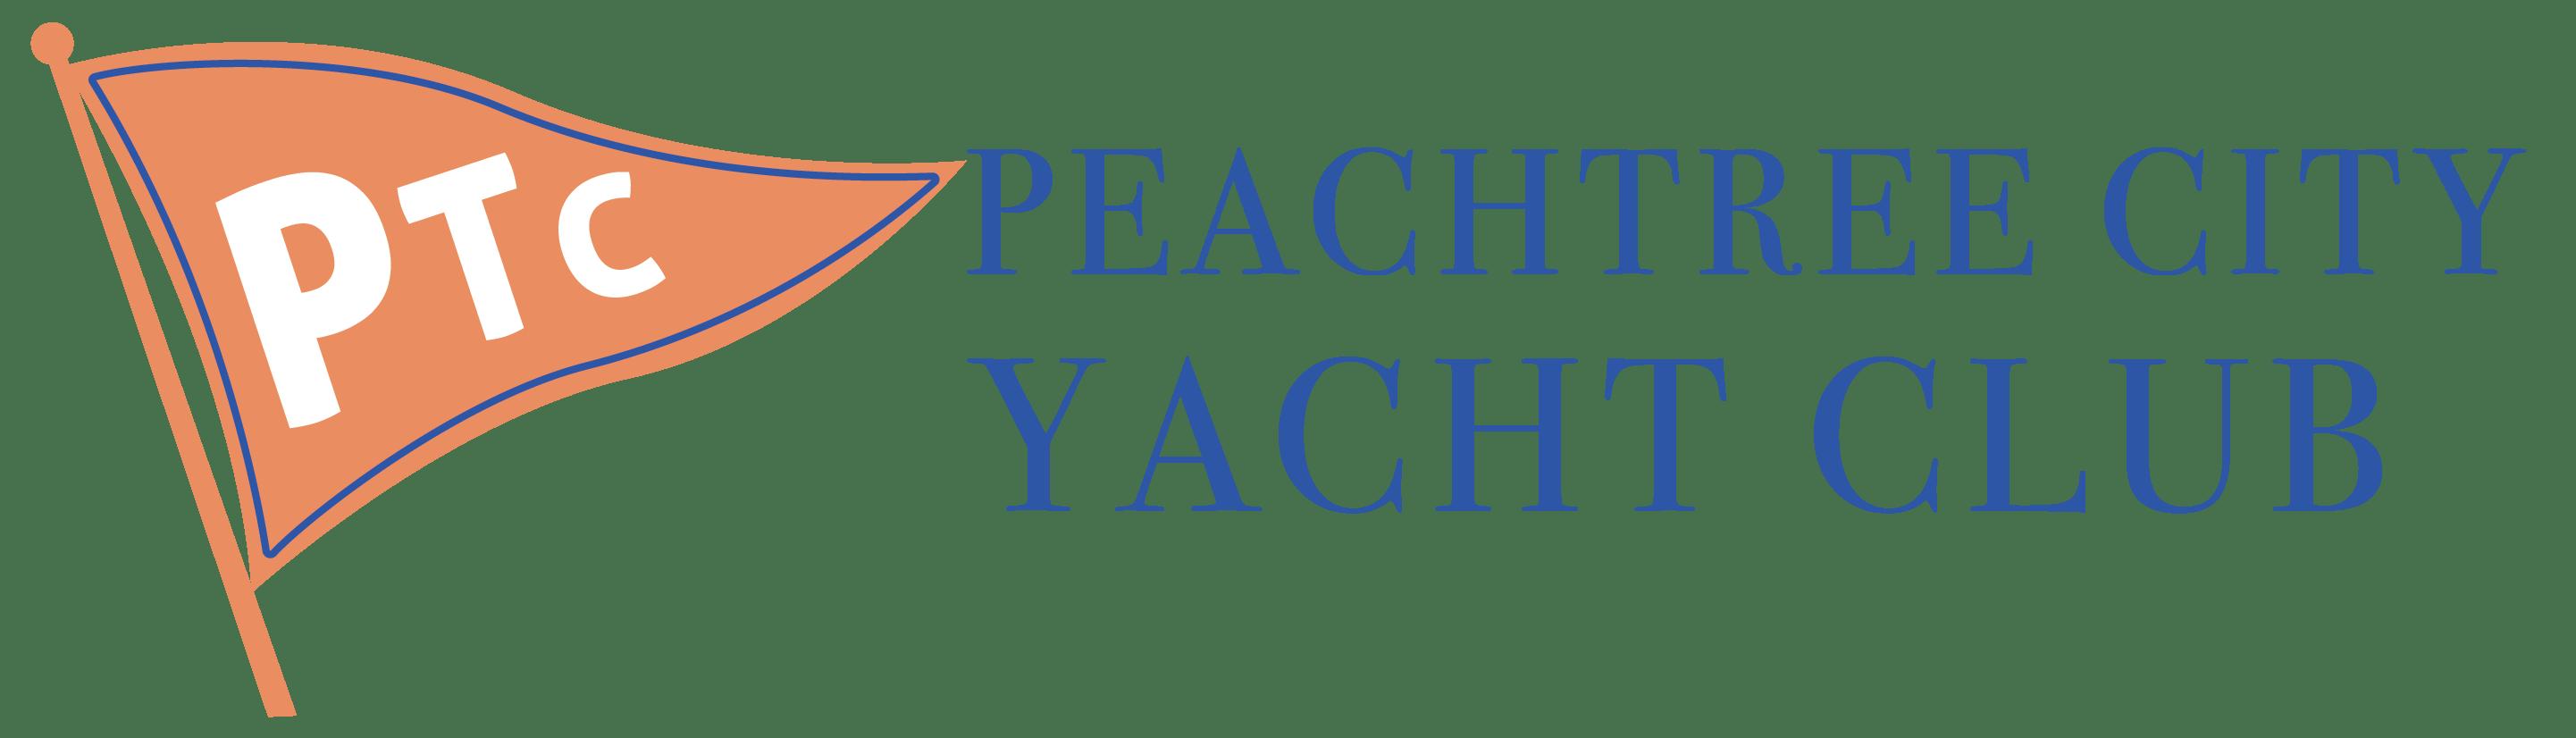 Peachtree City Yacht Club